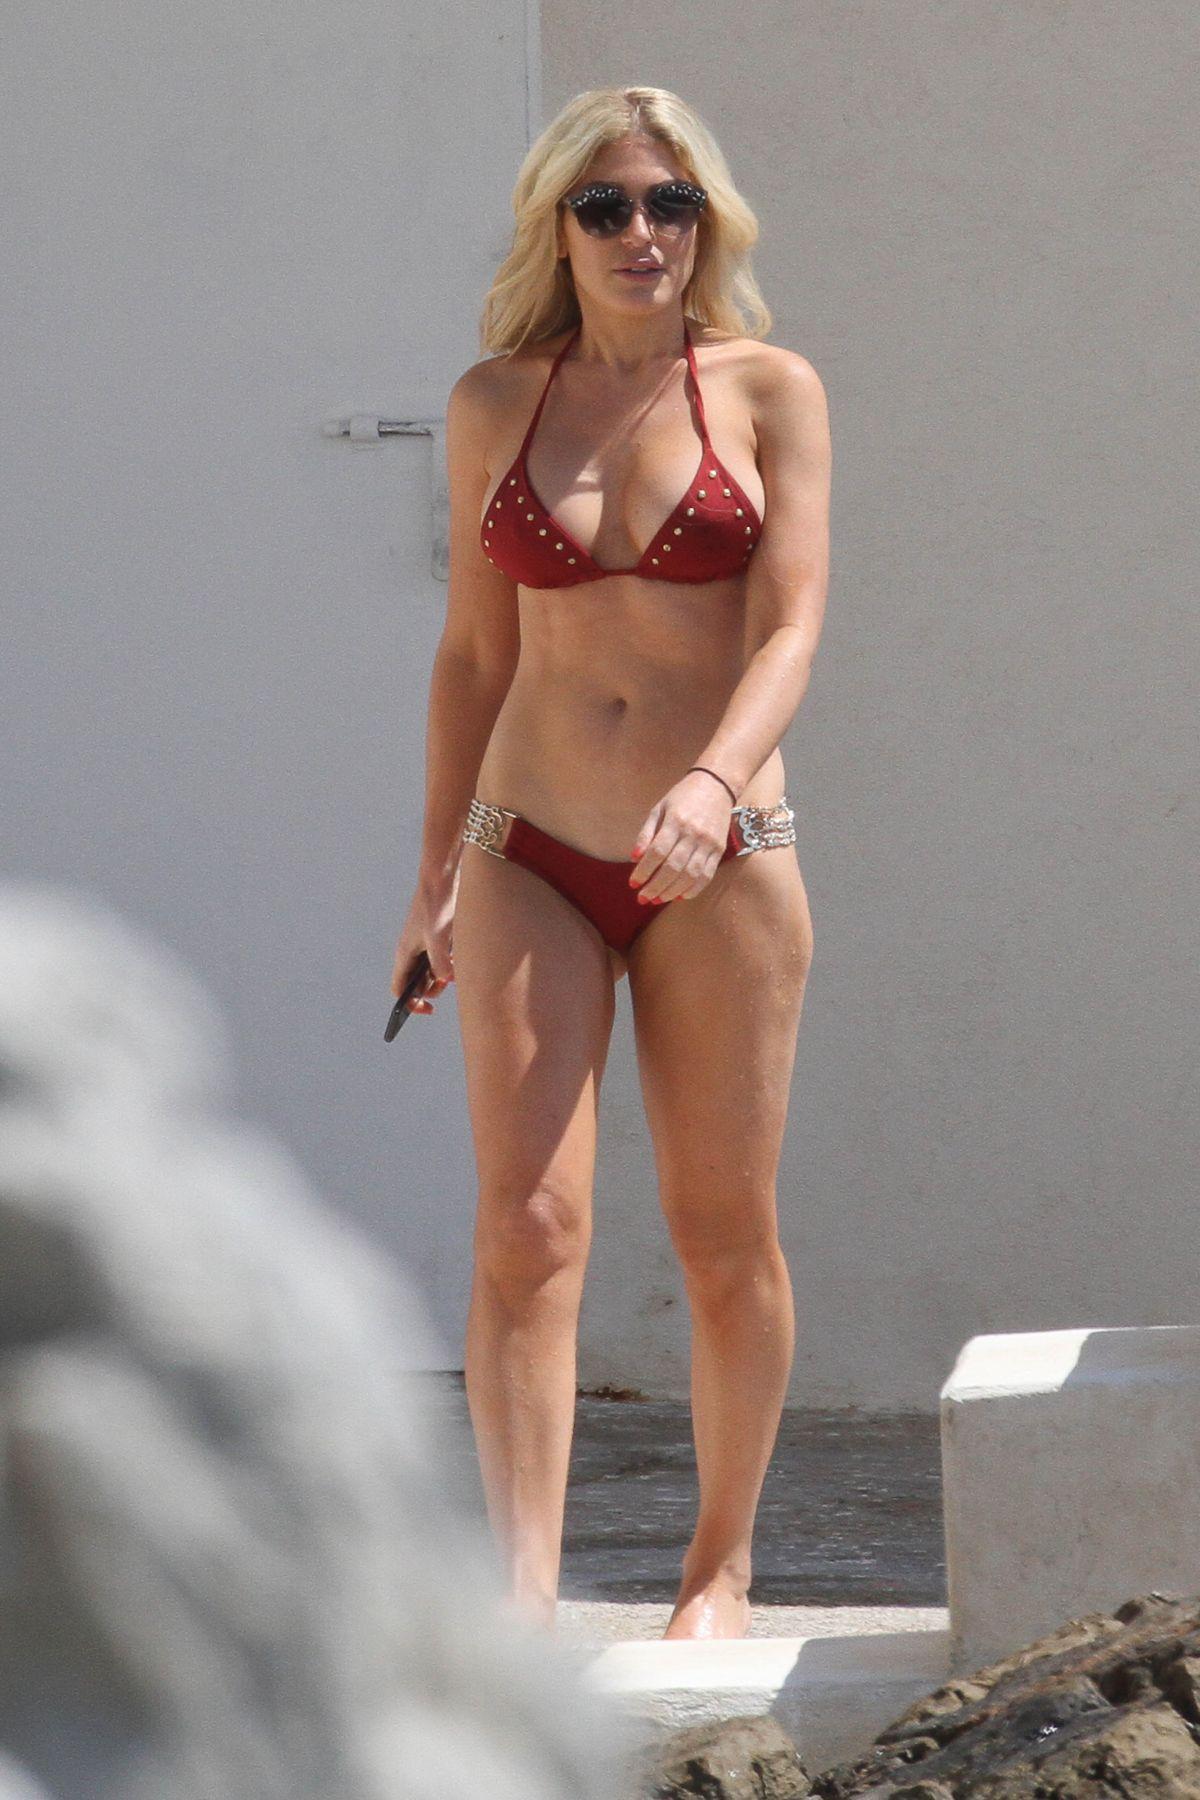 Bikini Hofit Golan nude photos 2019